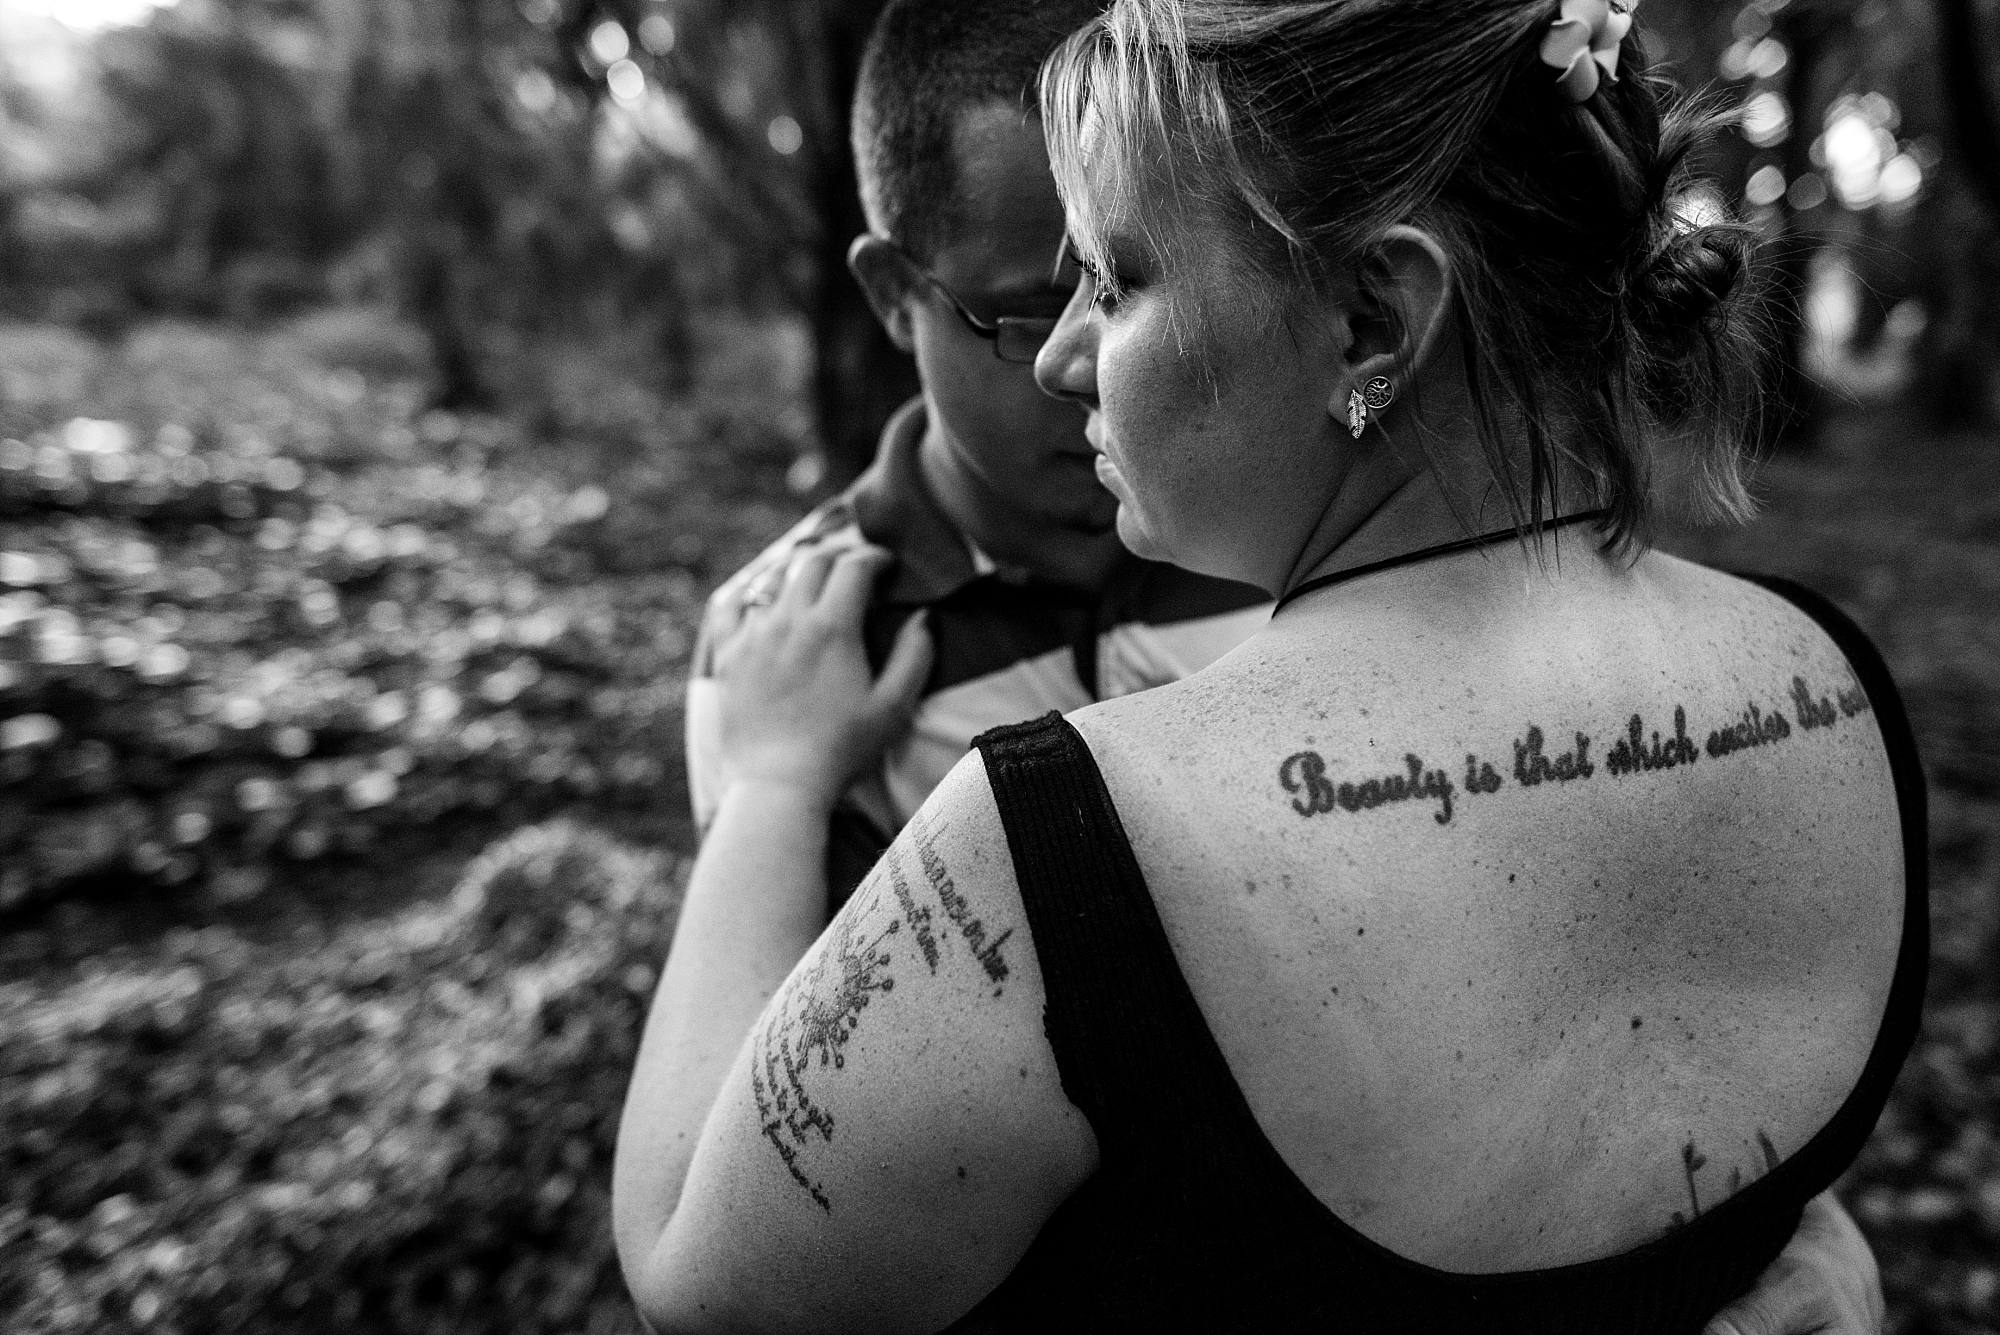 snuggling new fiances, back tattoo